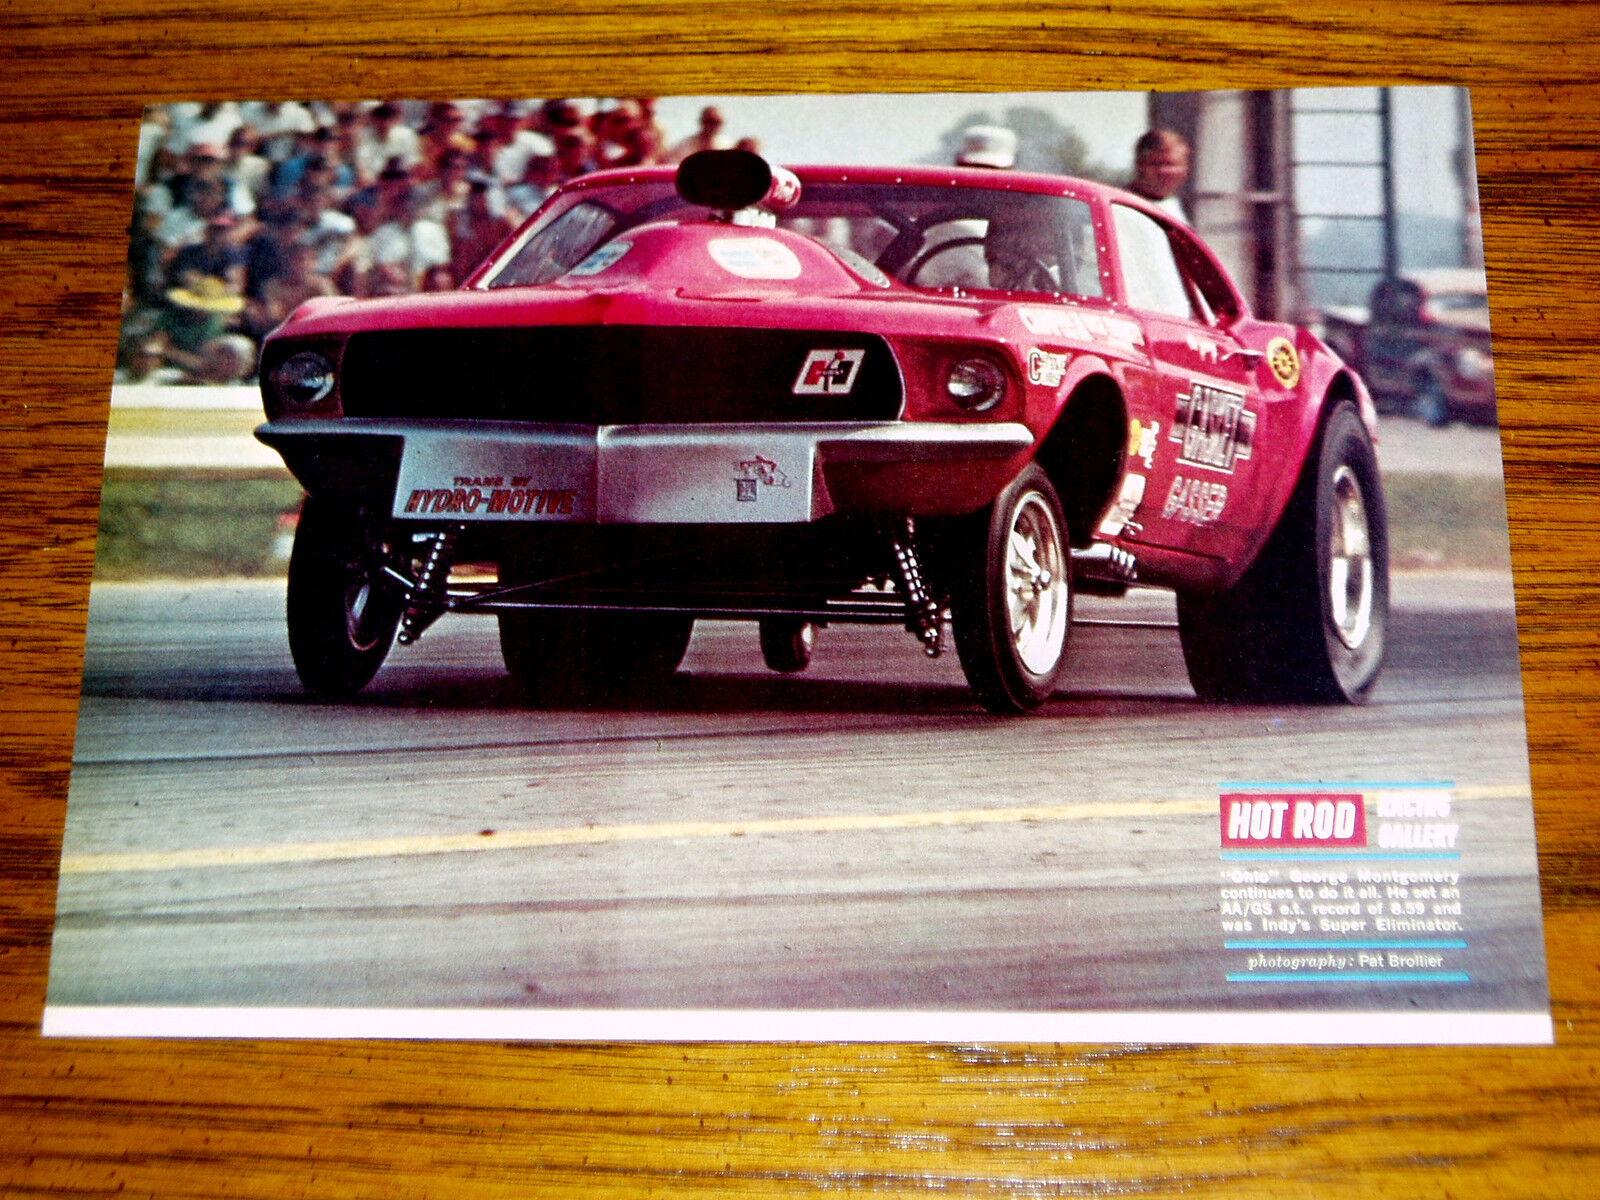 1967 ford mustang nhra - photo #7